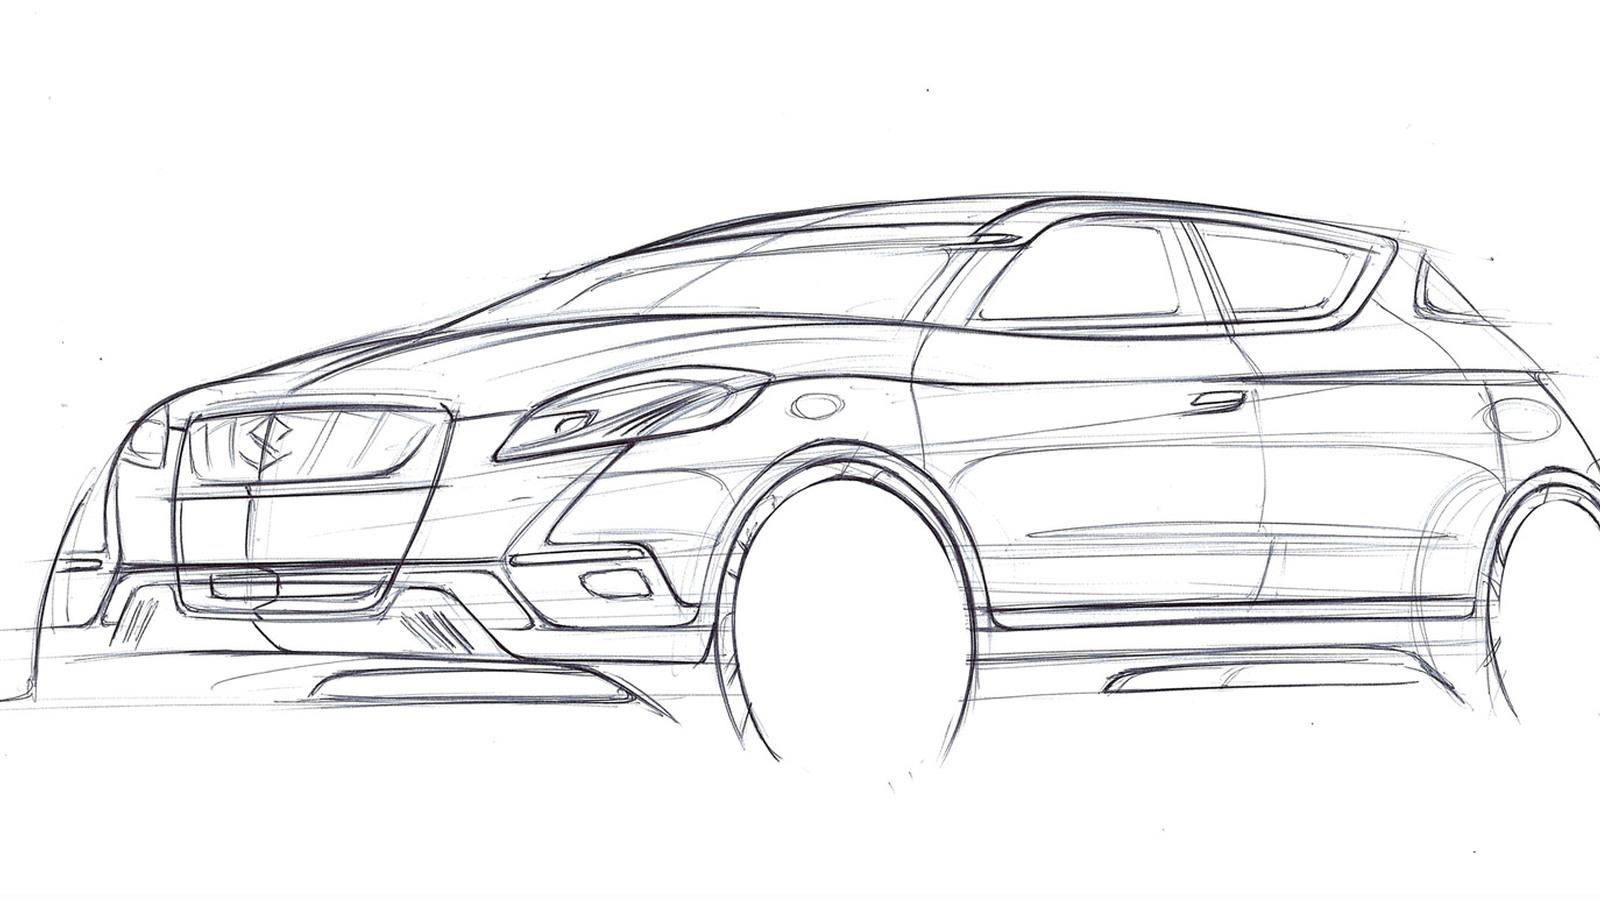 Suzuki S-Cross concept teased ahead of 2012 Paris Auto Show